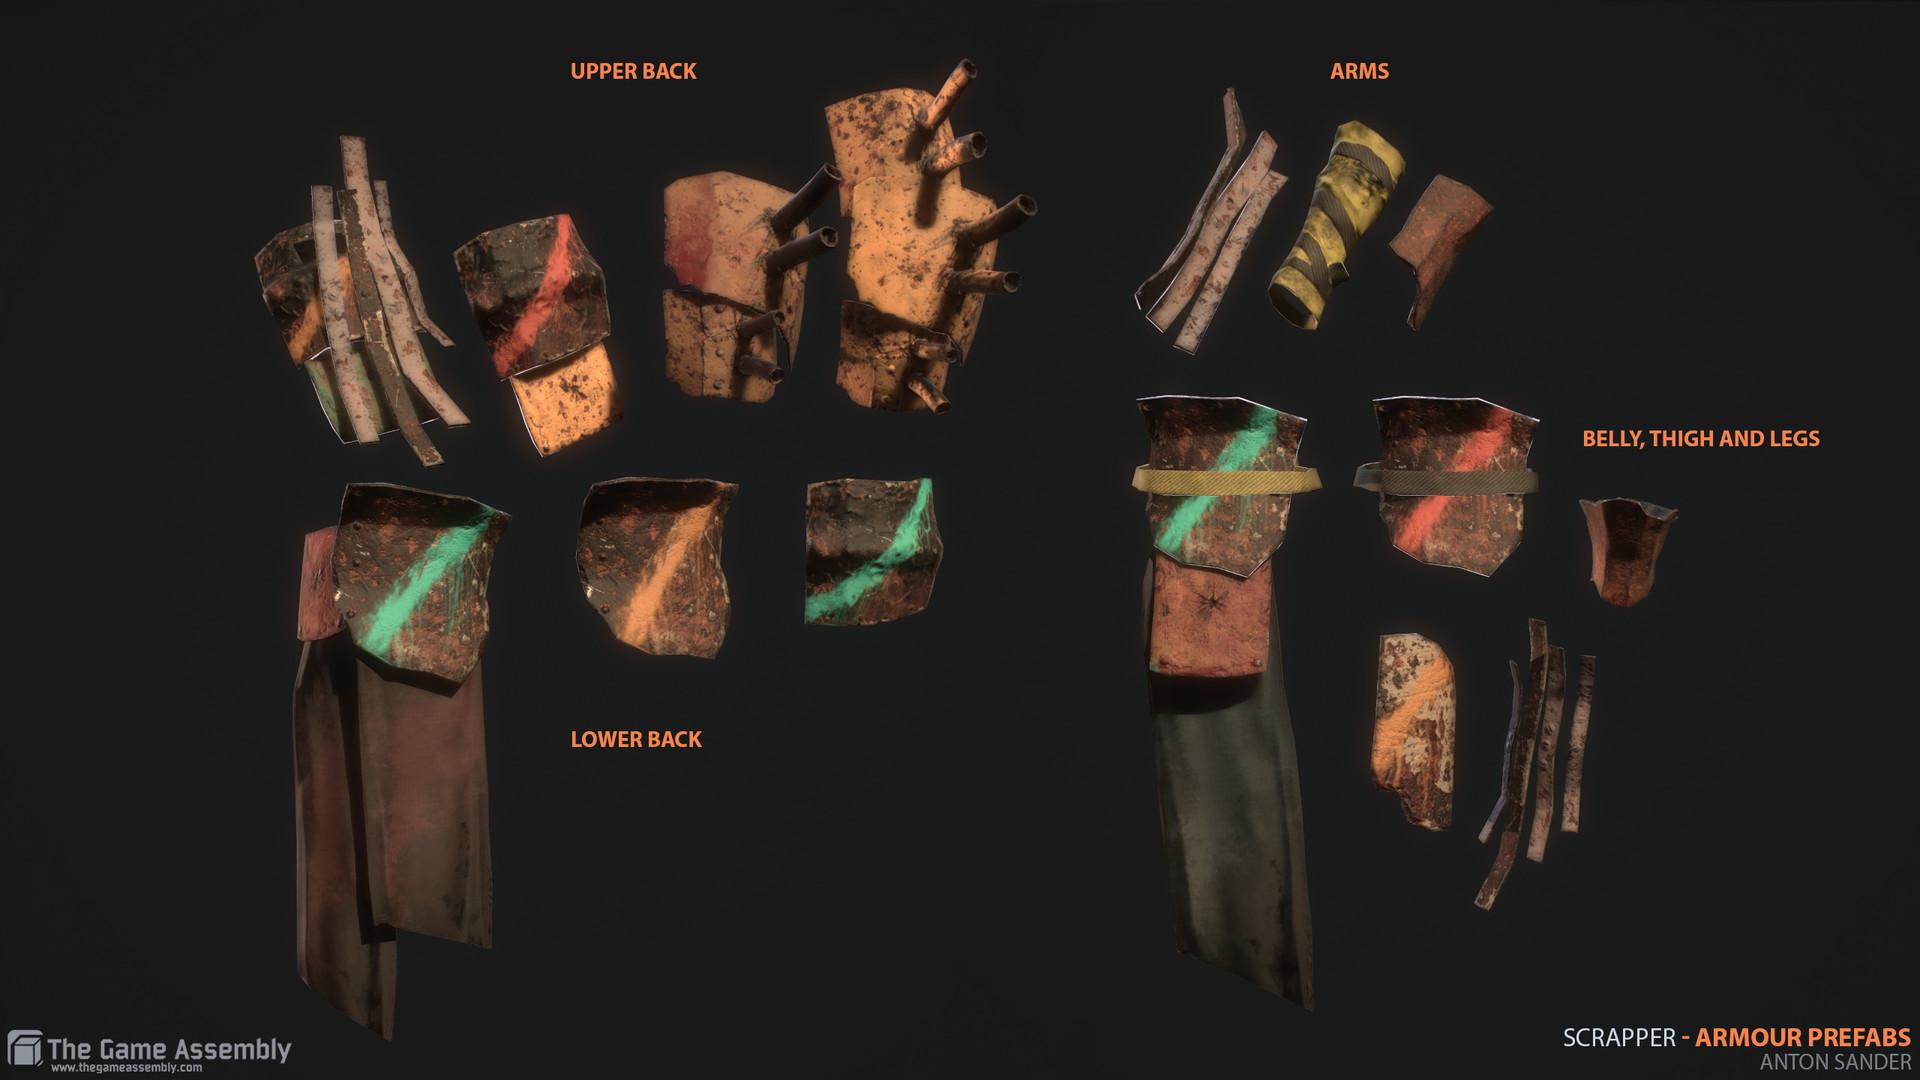 Anton sander scrappers armourprefabs back